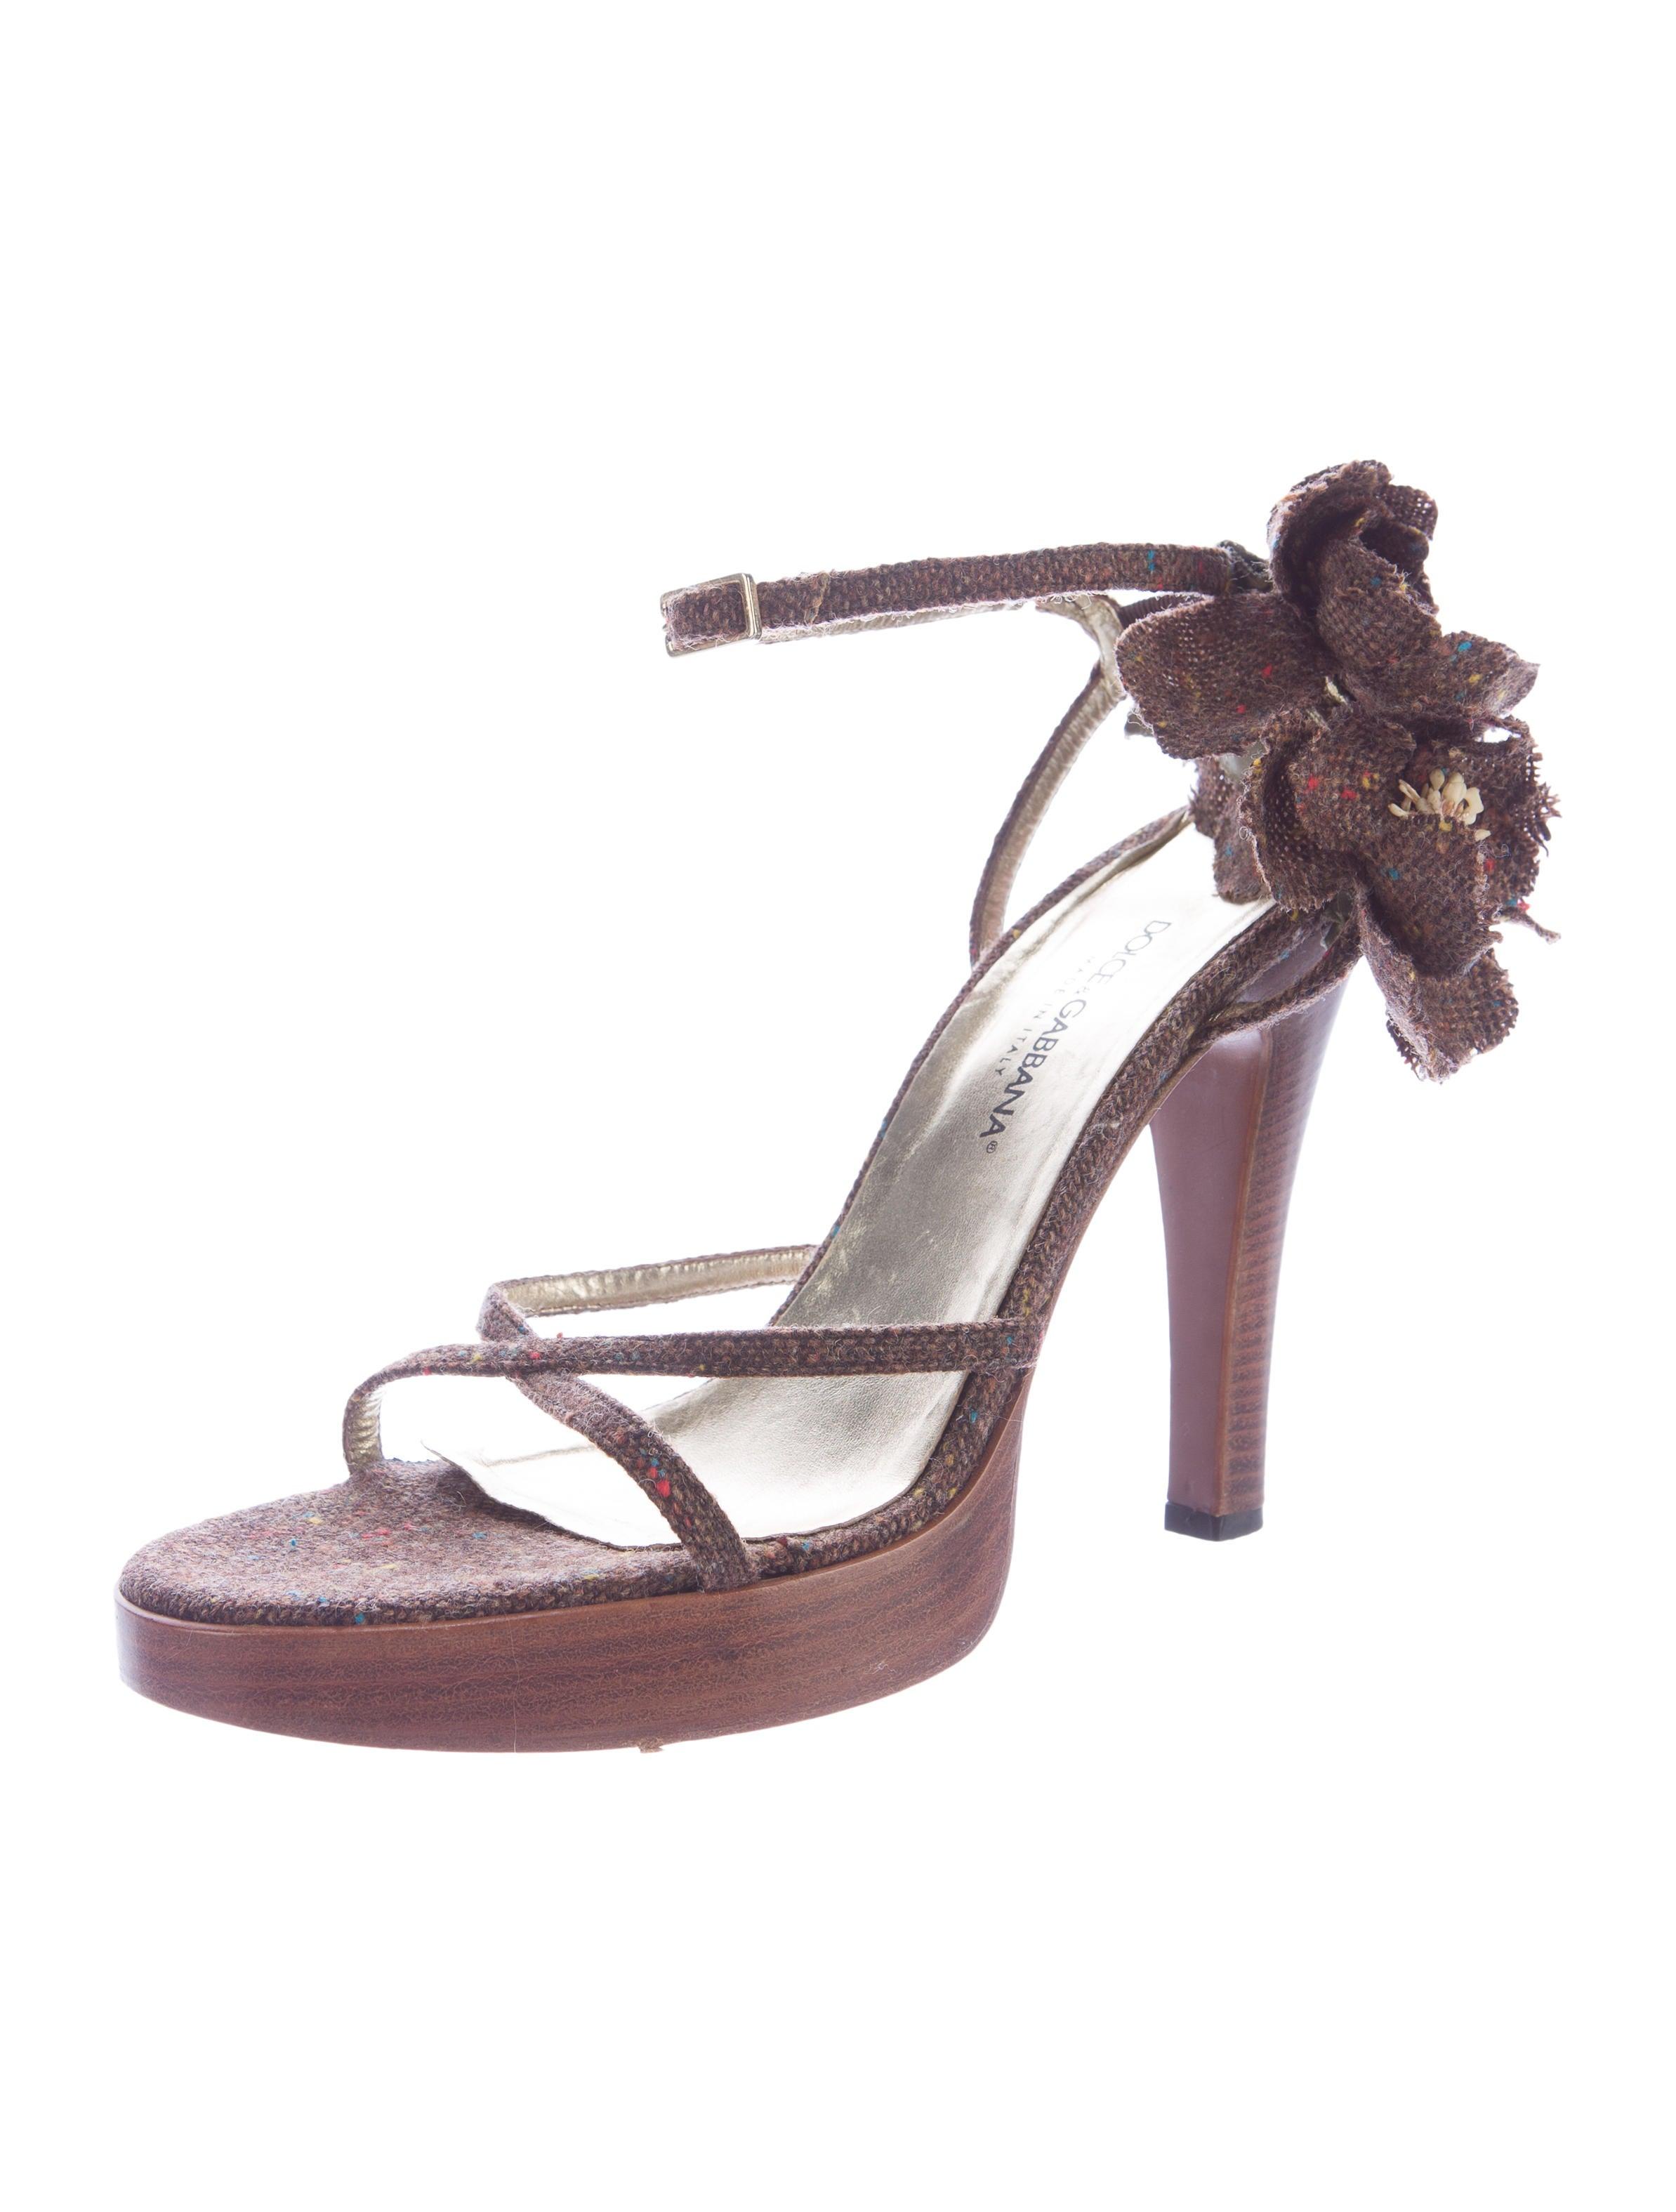 Dolce & Gabbana Tweed Floral Sandals - Shoes